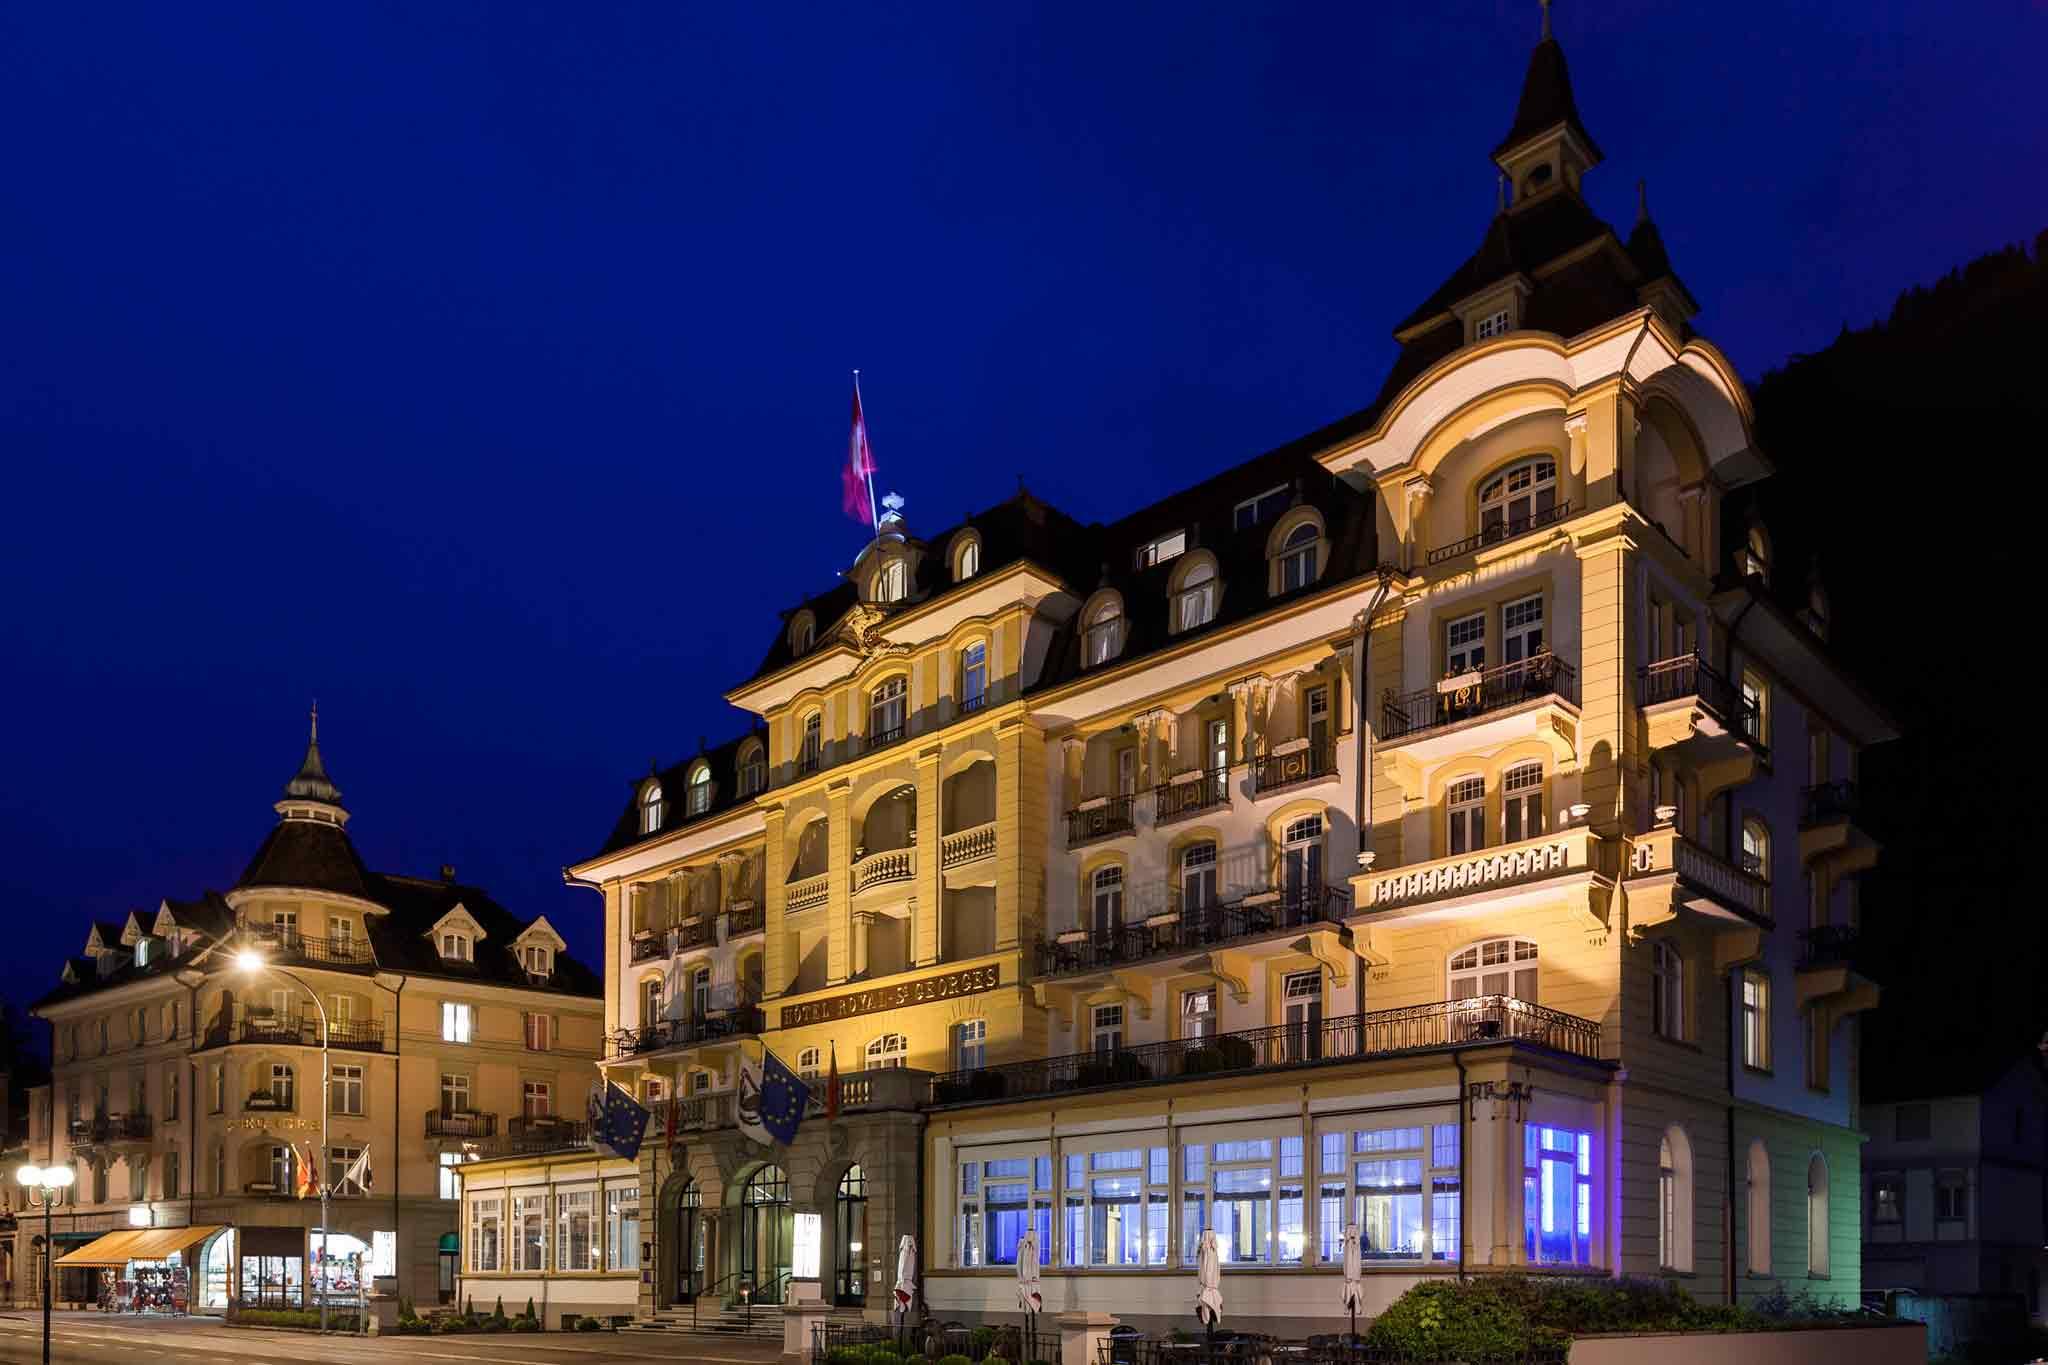 Hôtel - Hotel Royal St Georges Interlaken - MGallery by Sofitel